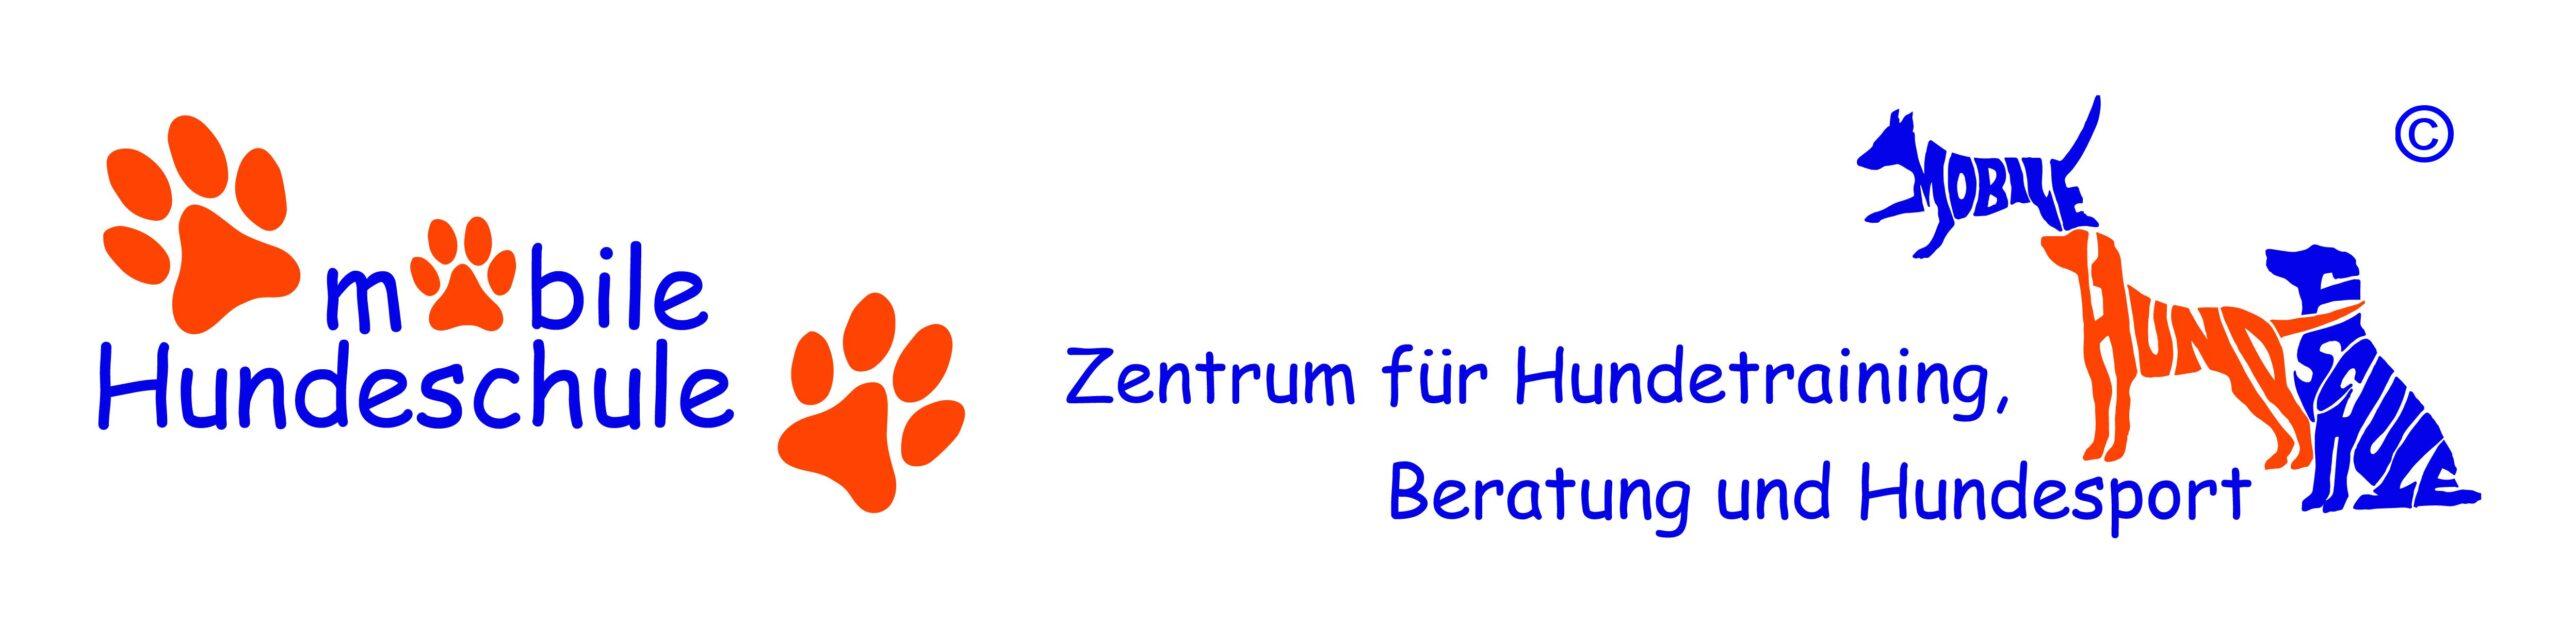 2020-06-19_5eece3bd3d13d_mobile-hundeschule_logo-komplettCopyDruck-300dpi